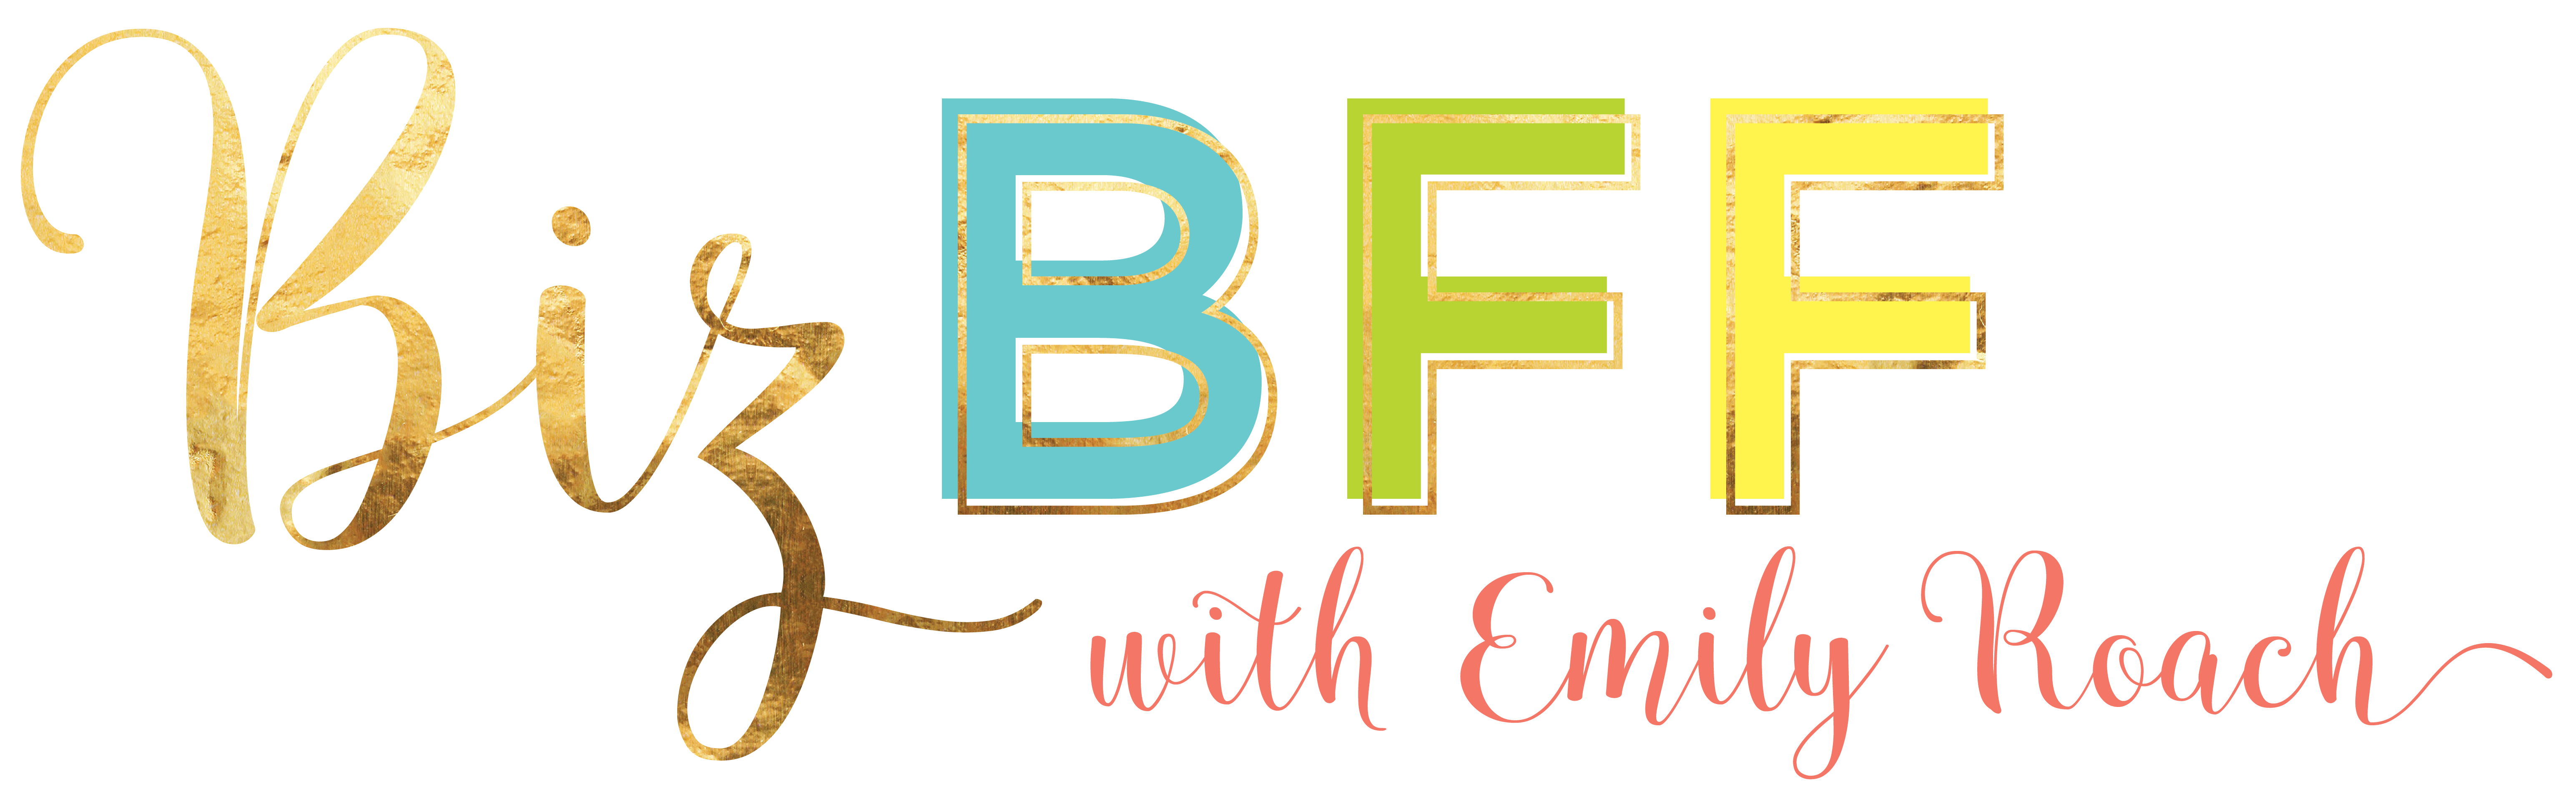 Heat clipart bff. Biz emily roach logo